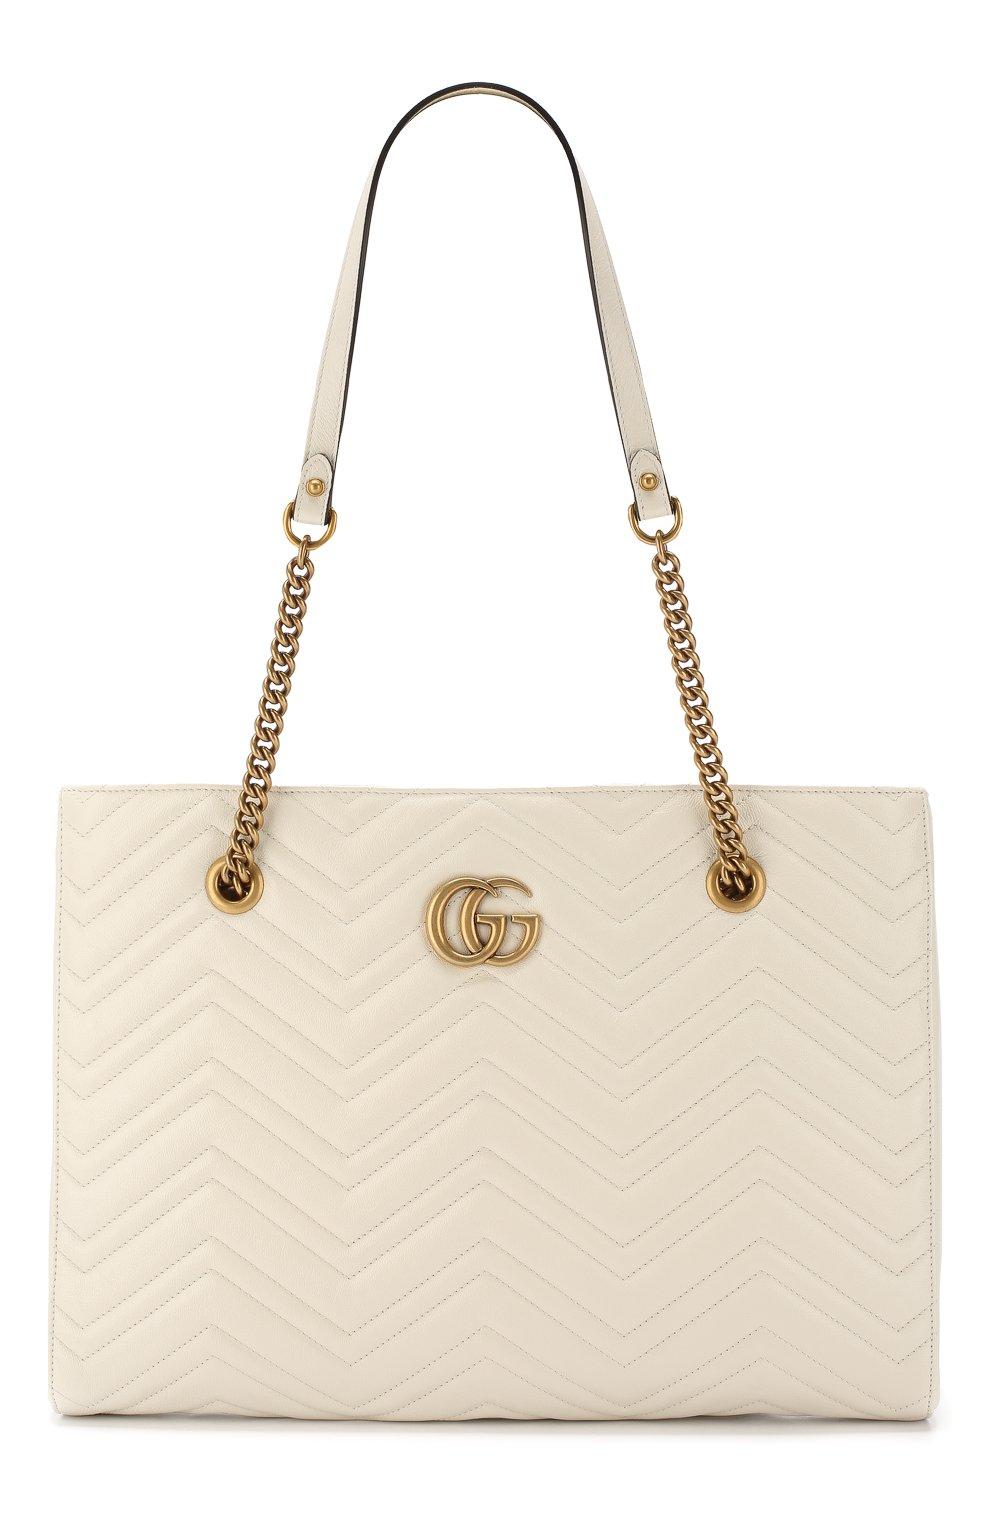 Сумка-тоут GG Marmont  Gucci кремовая цвета | Фото №1